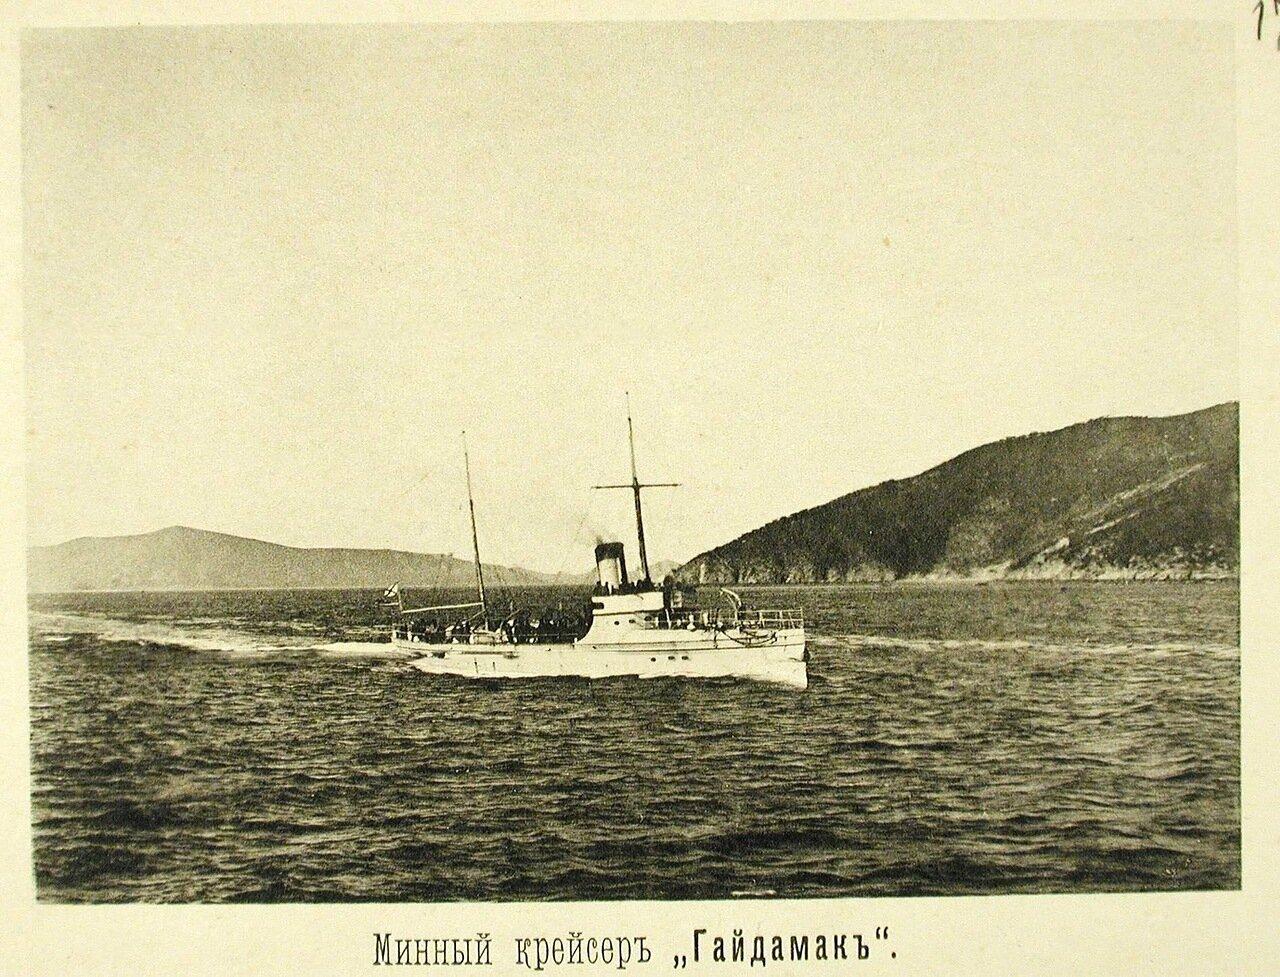 17. Минный крейсер Гайдамак.  Чифу. 26 апреля 1895